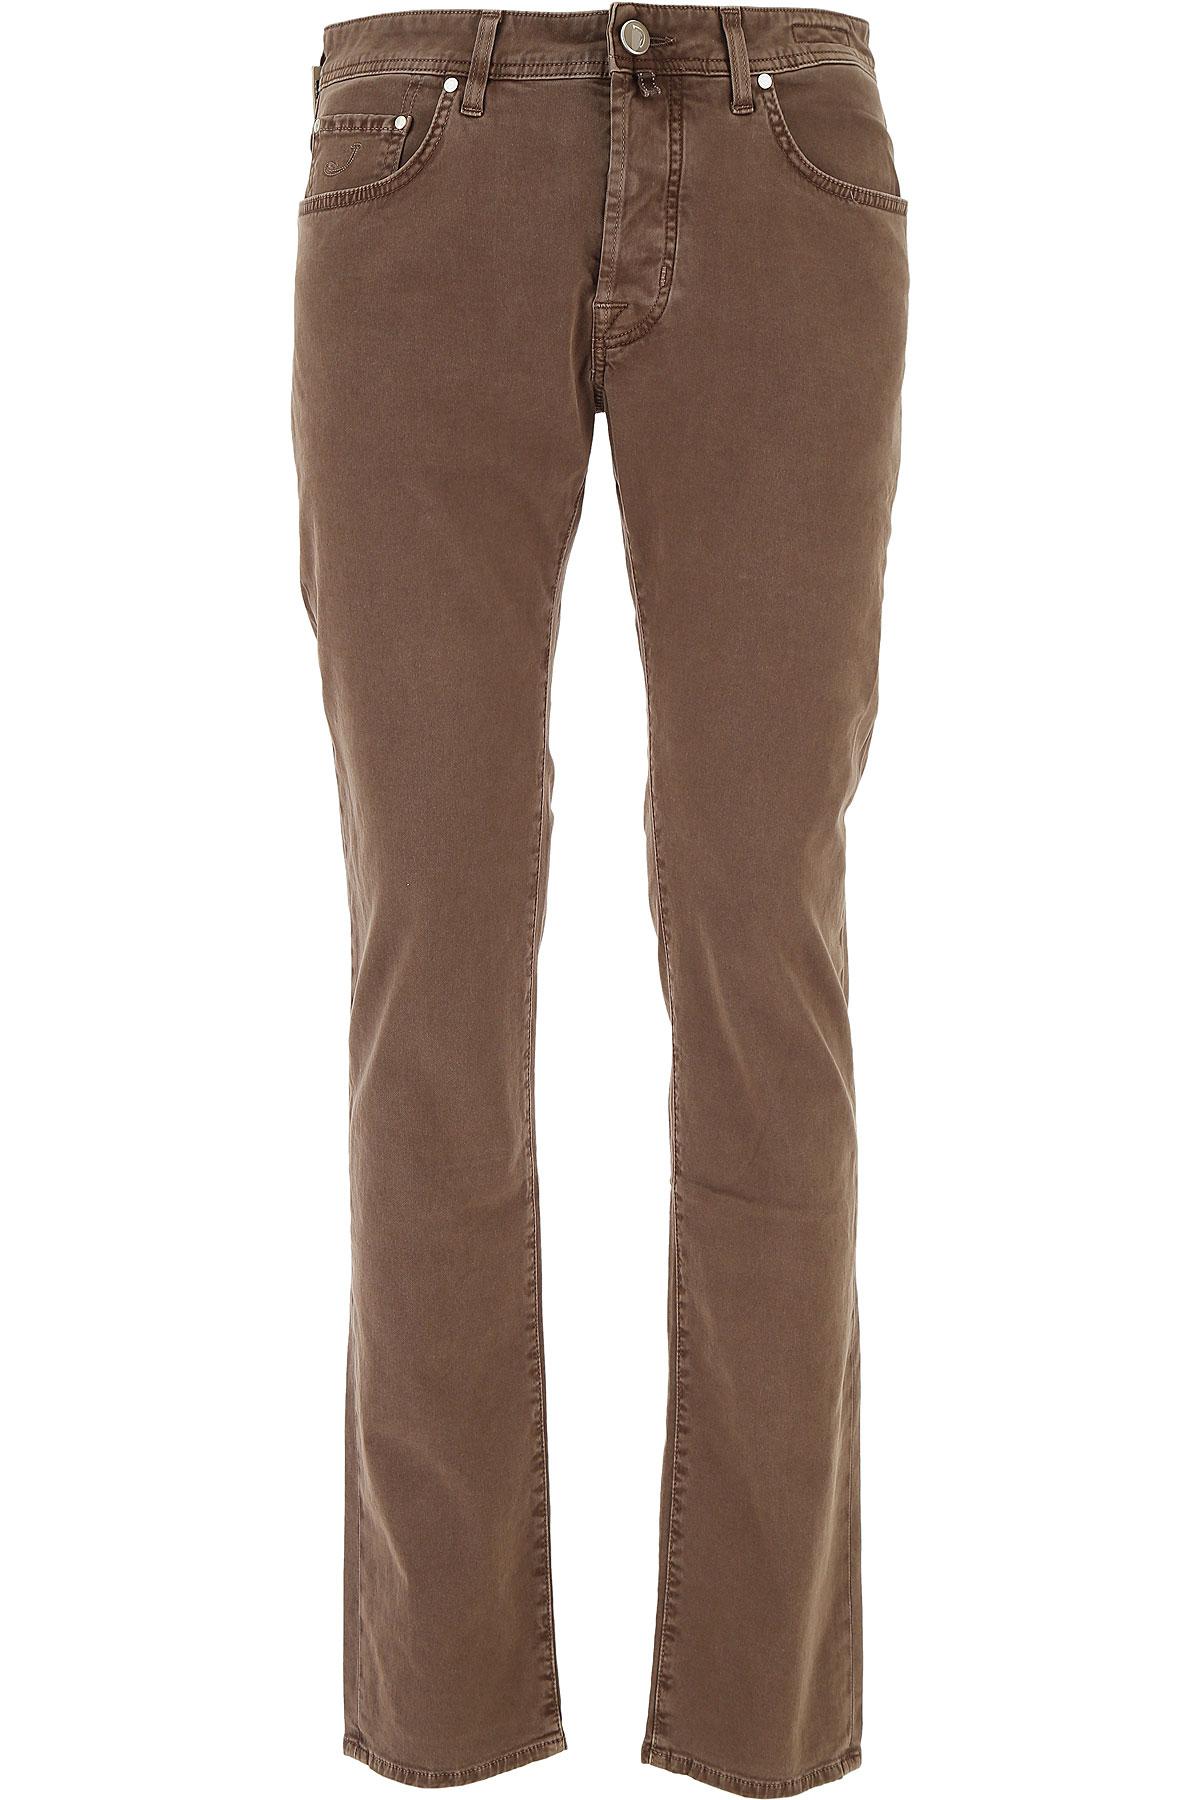 Jacob Cohen Jeans On Sale in Outlet, Chocolate Mousse, Cotton, 2017, US 32 - EU 48 US 33 - EU 49 USA-411876